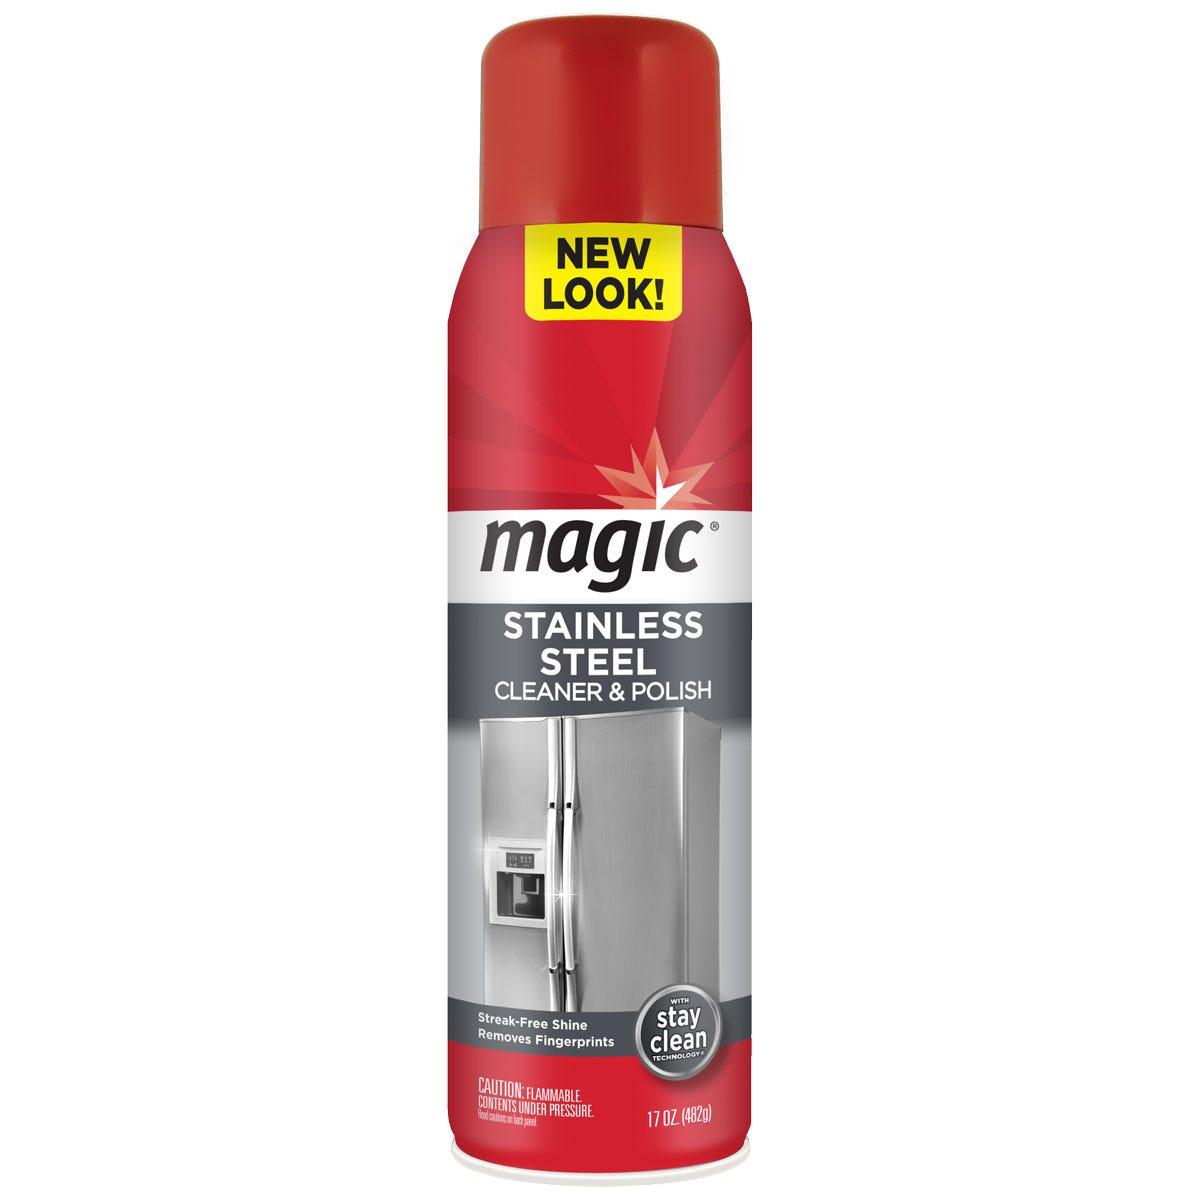 https://googone.com/media/catalog/product/m/a/magic-stainless-cleaner-aerosol_front.jpg